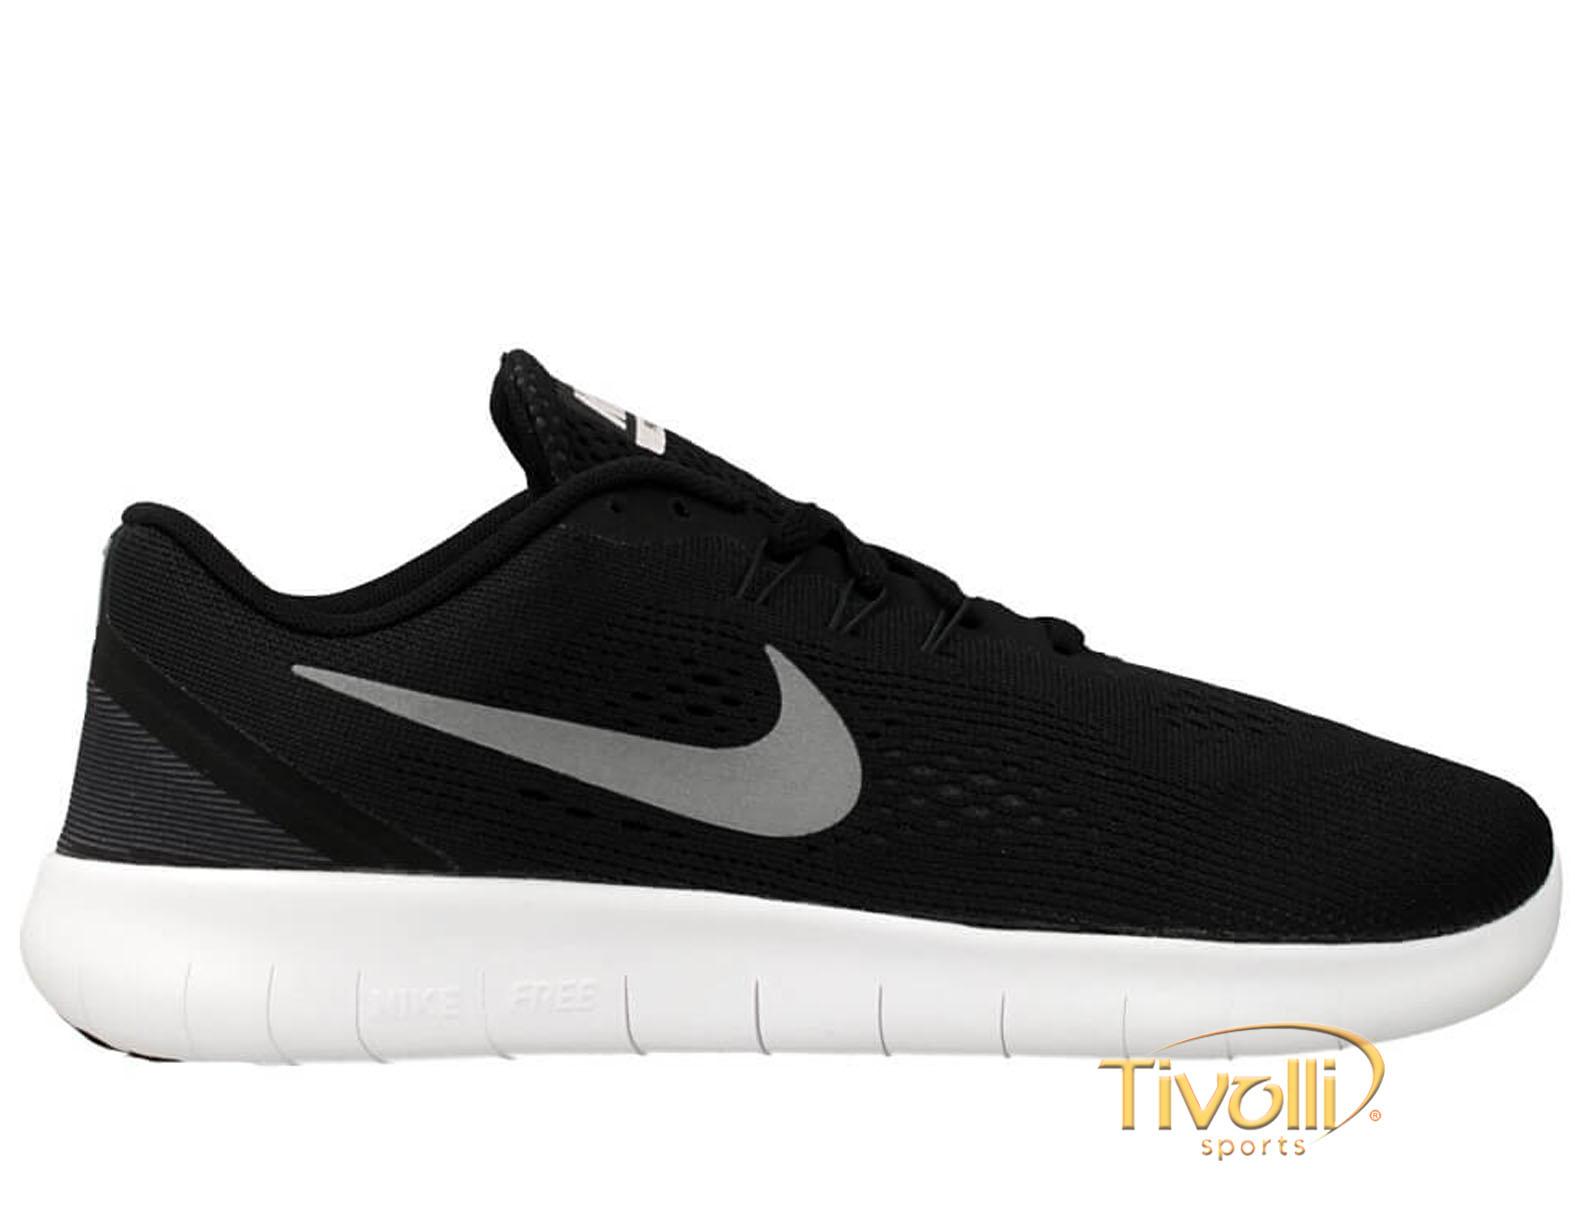 Tênis Nike Free RN GS   Preto e Branco   1f2e4126e10cf